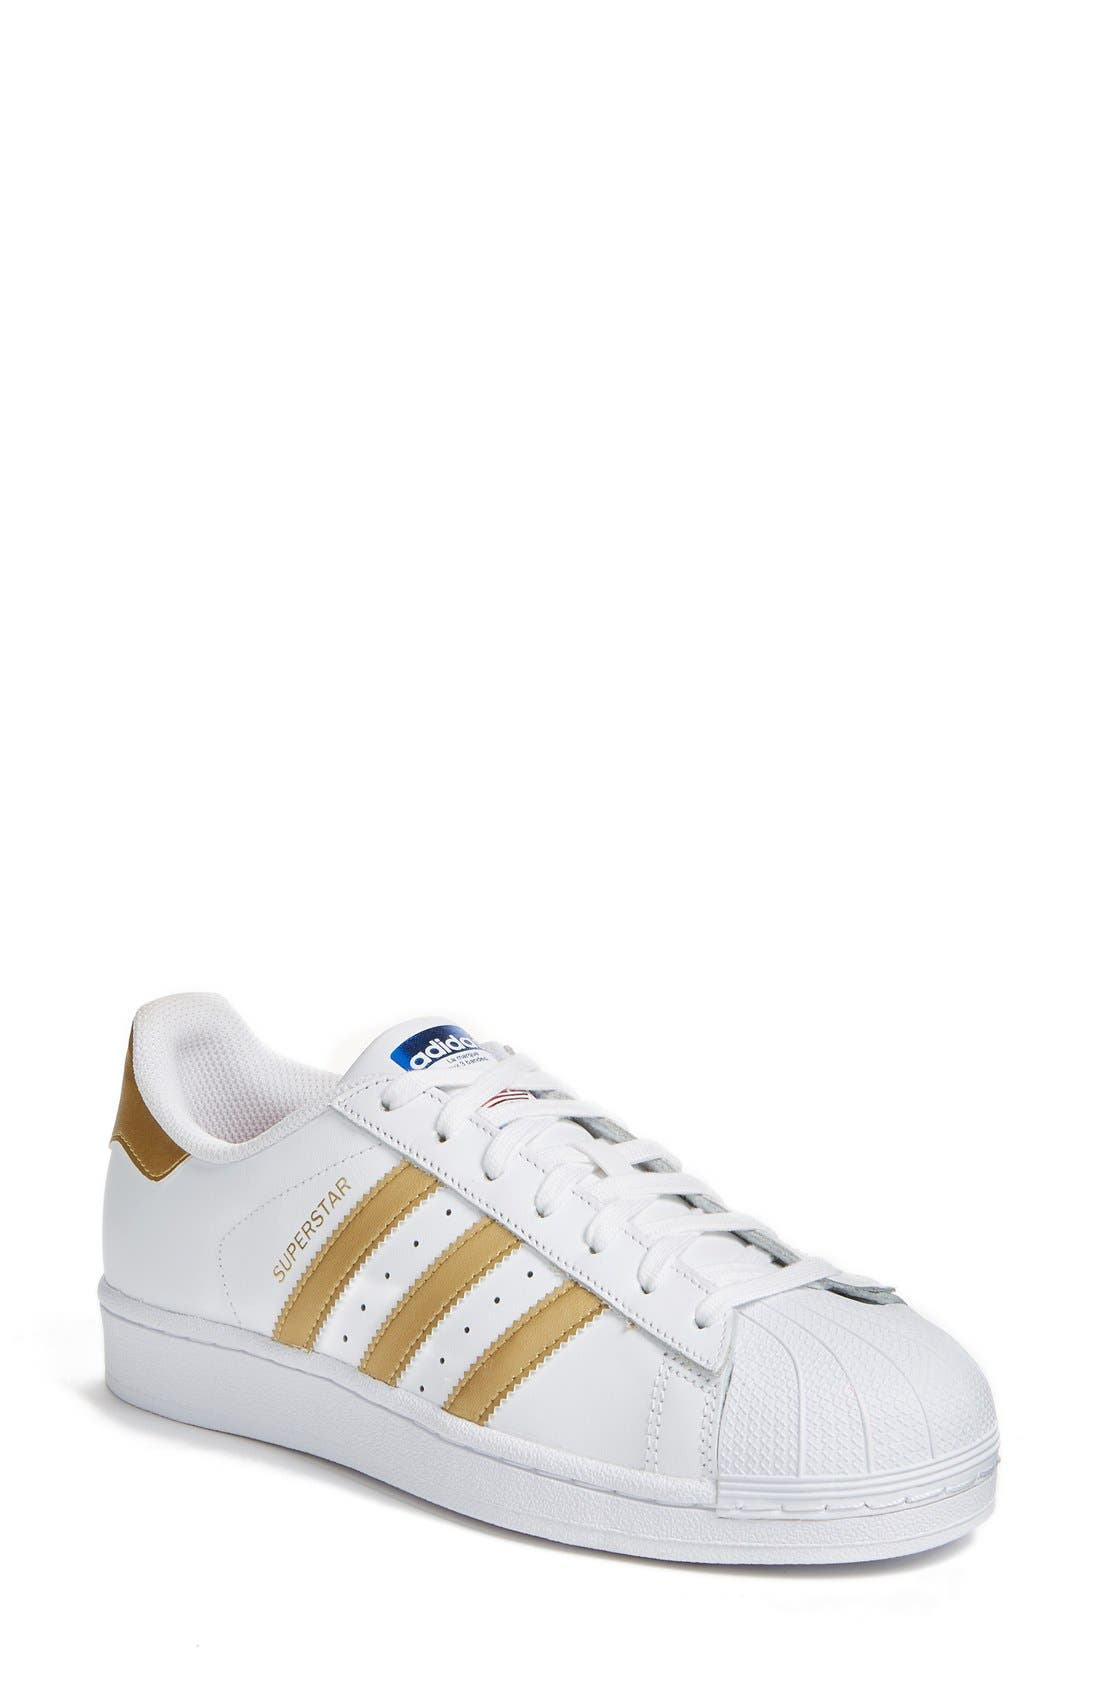 Main Image - adidas Superstar Sneaker